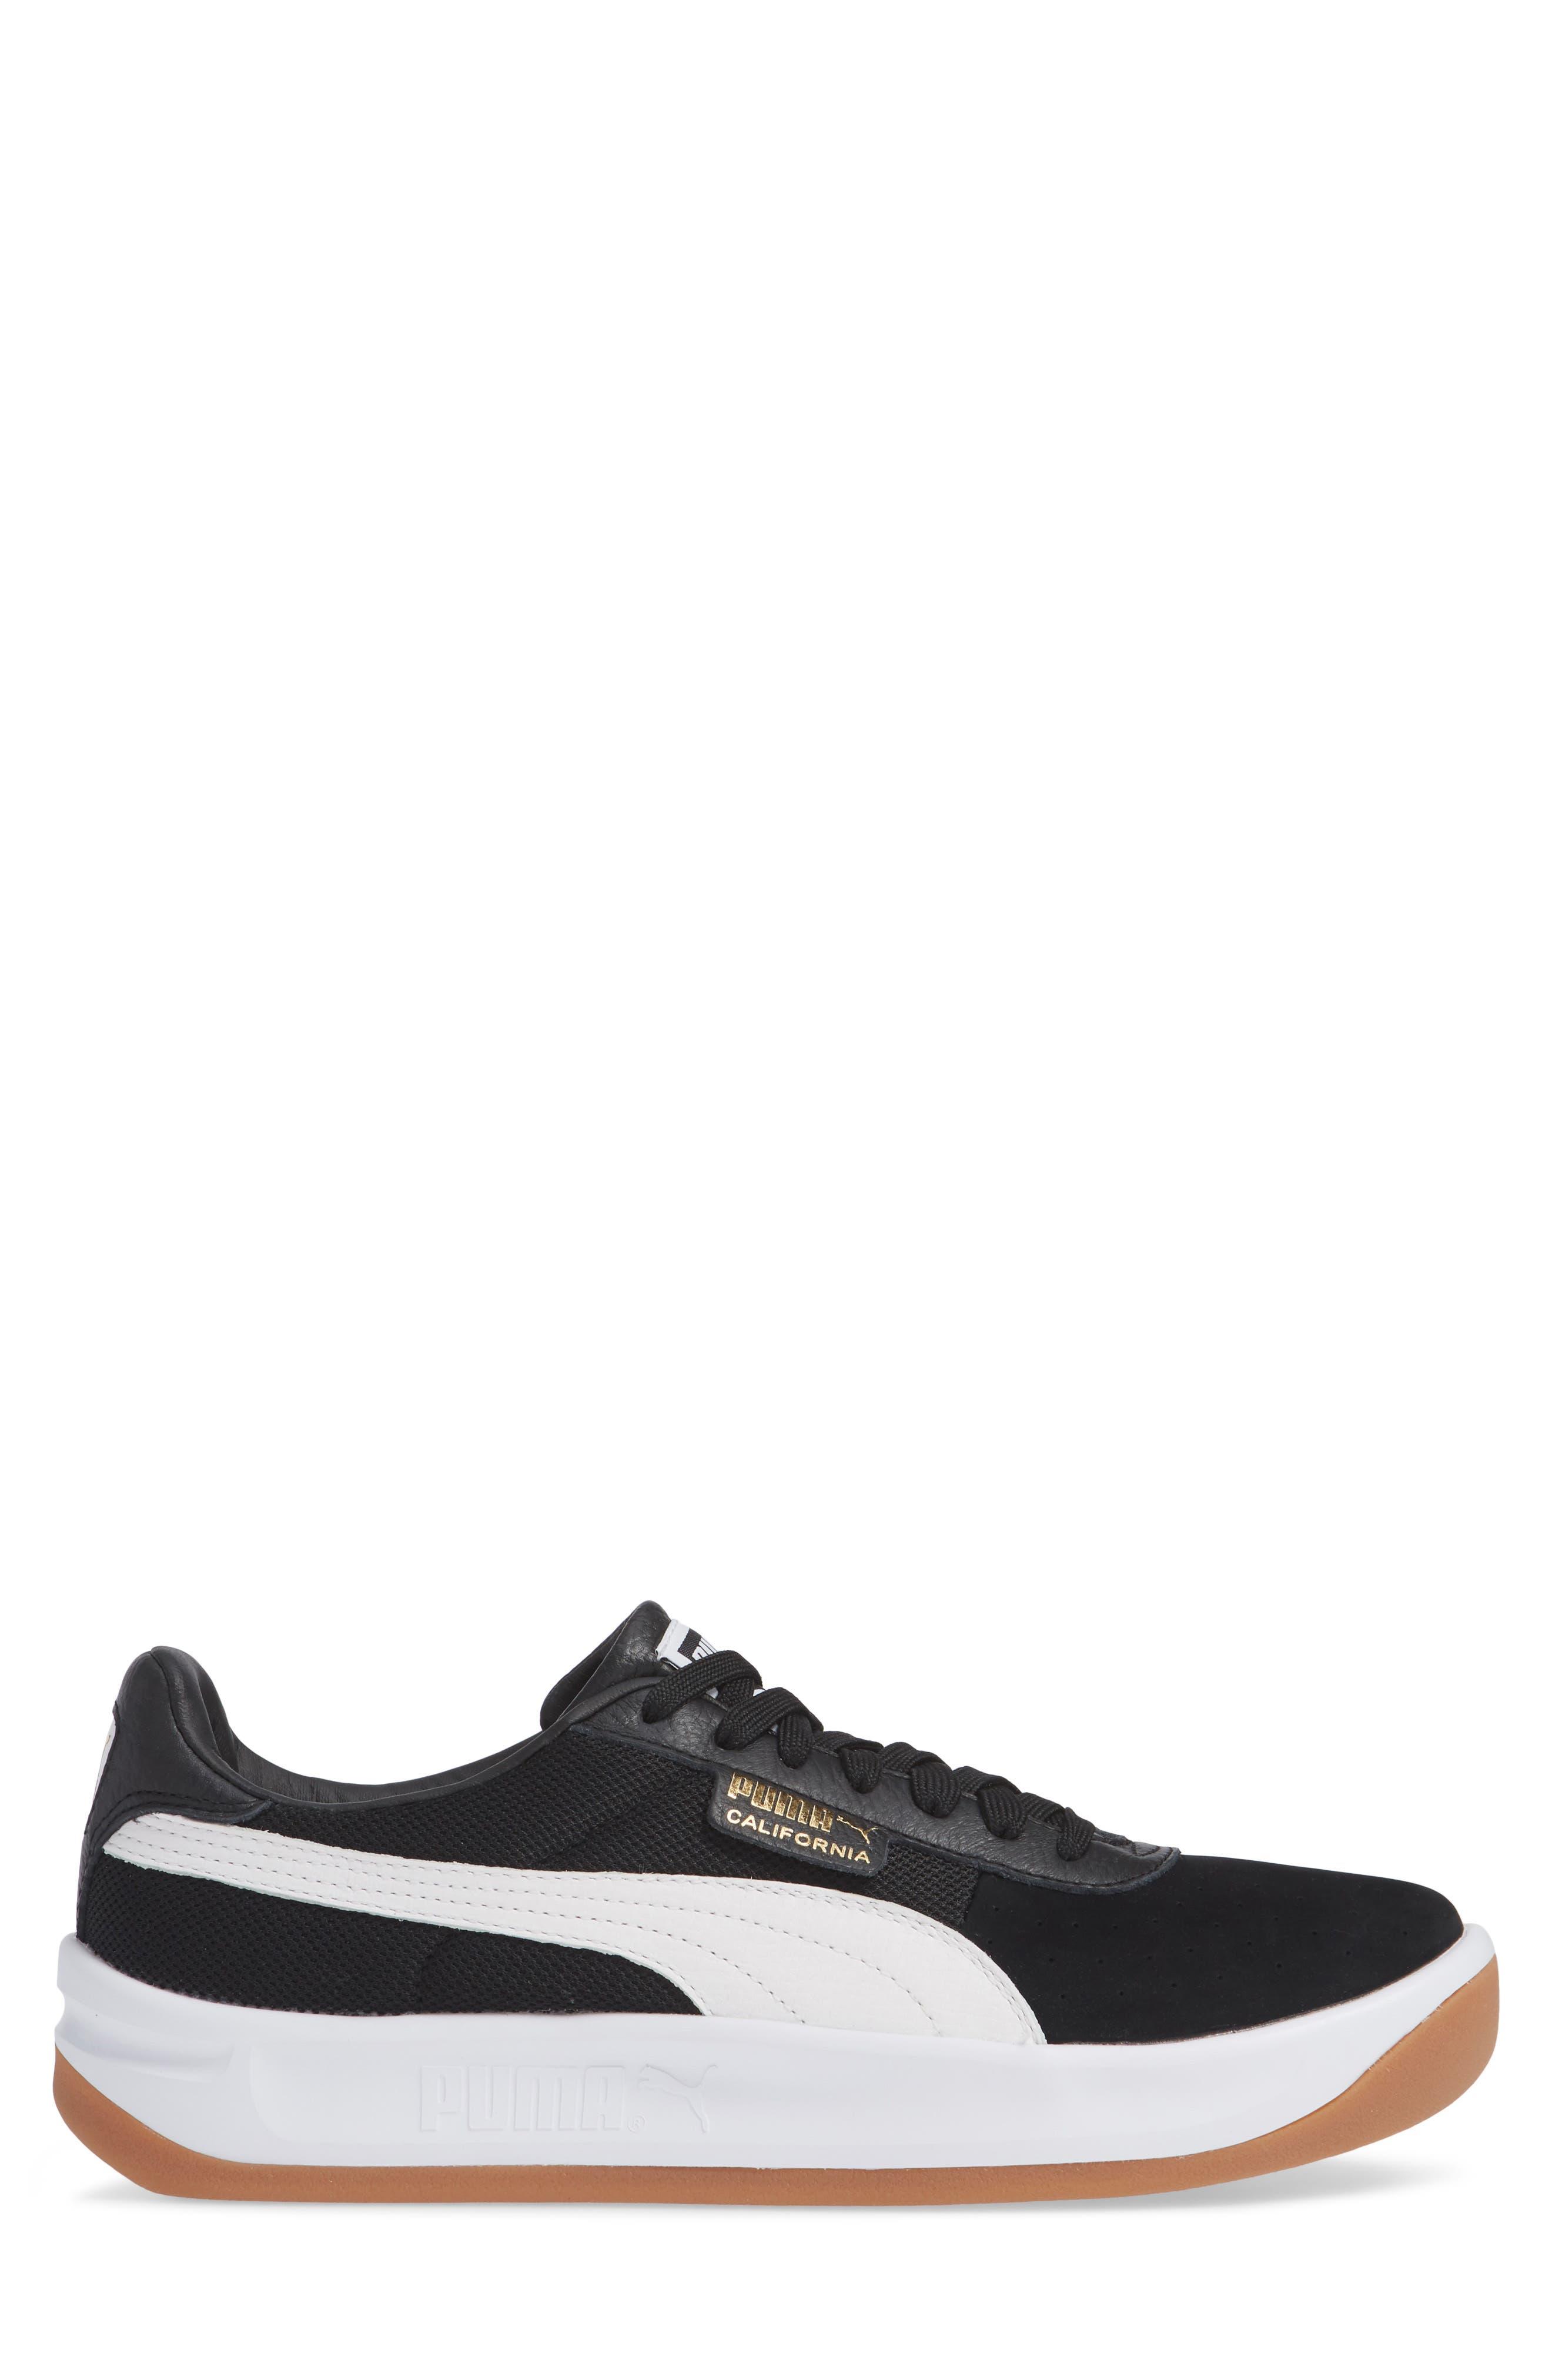 PUMA,                             California Casual Sneaker,                             Alternate thumbnail 3, color,                             001